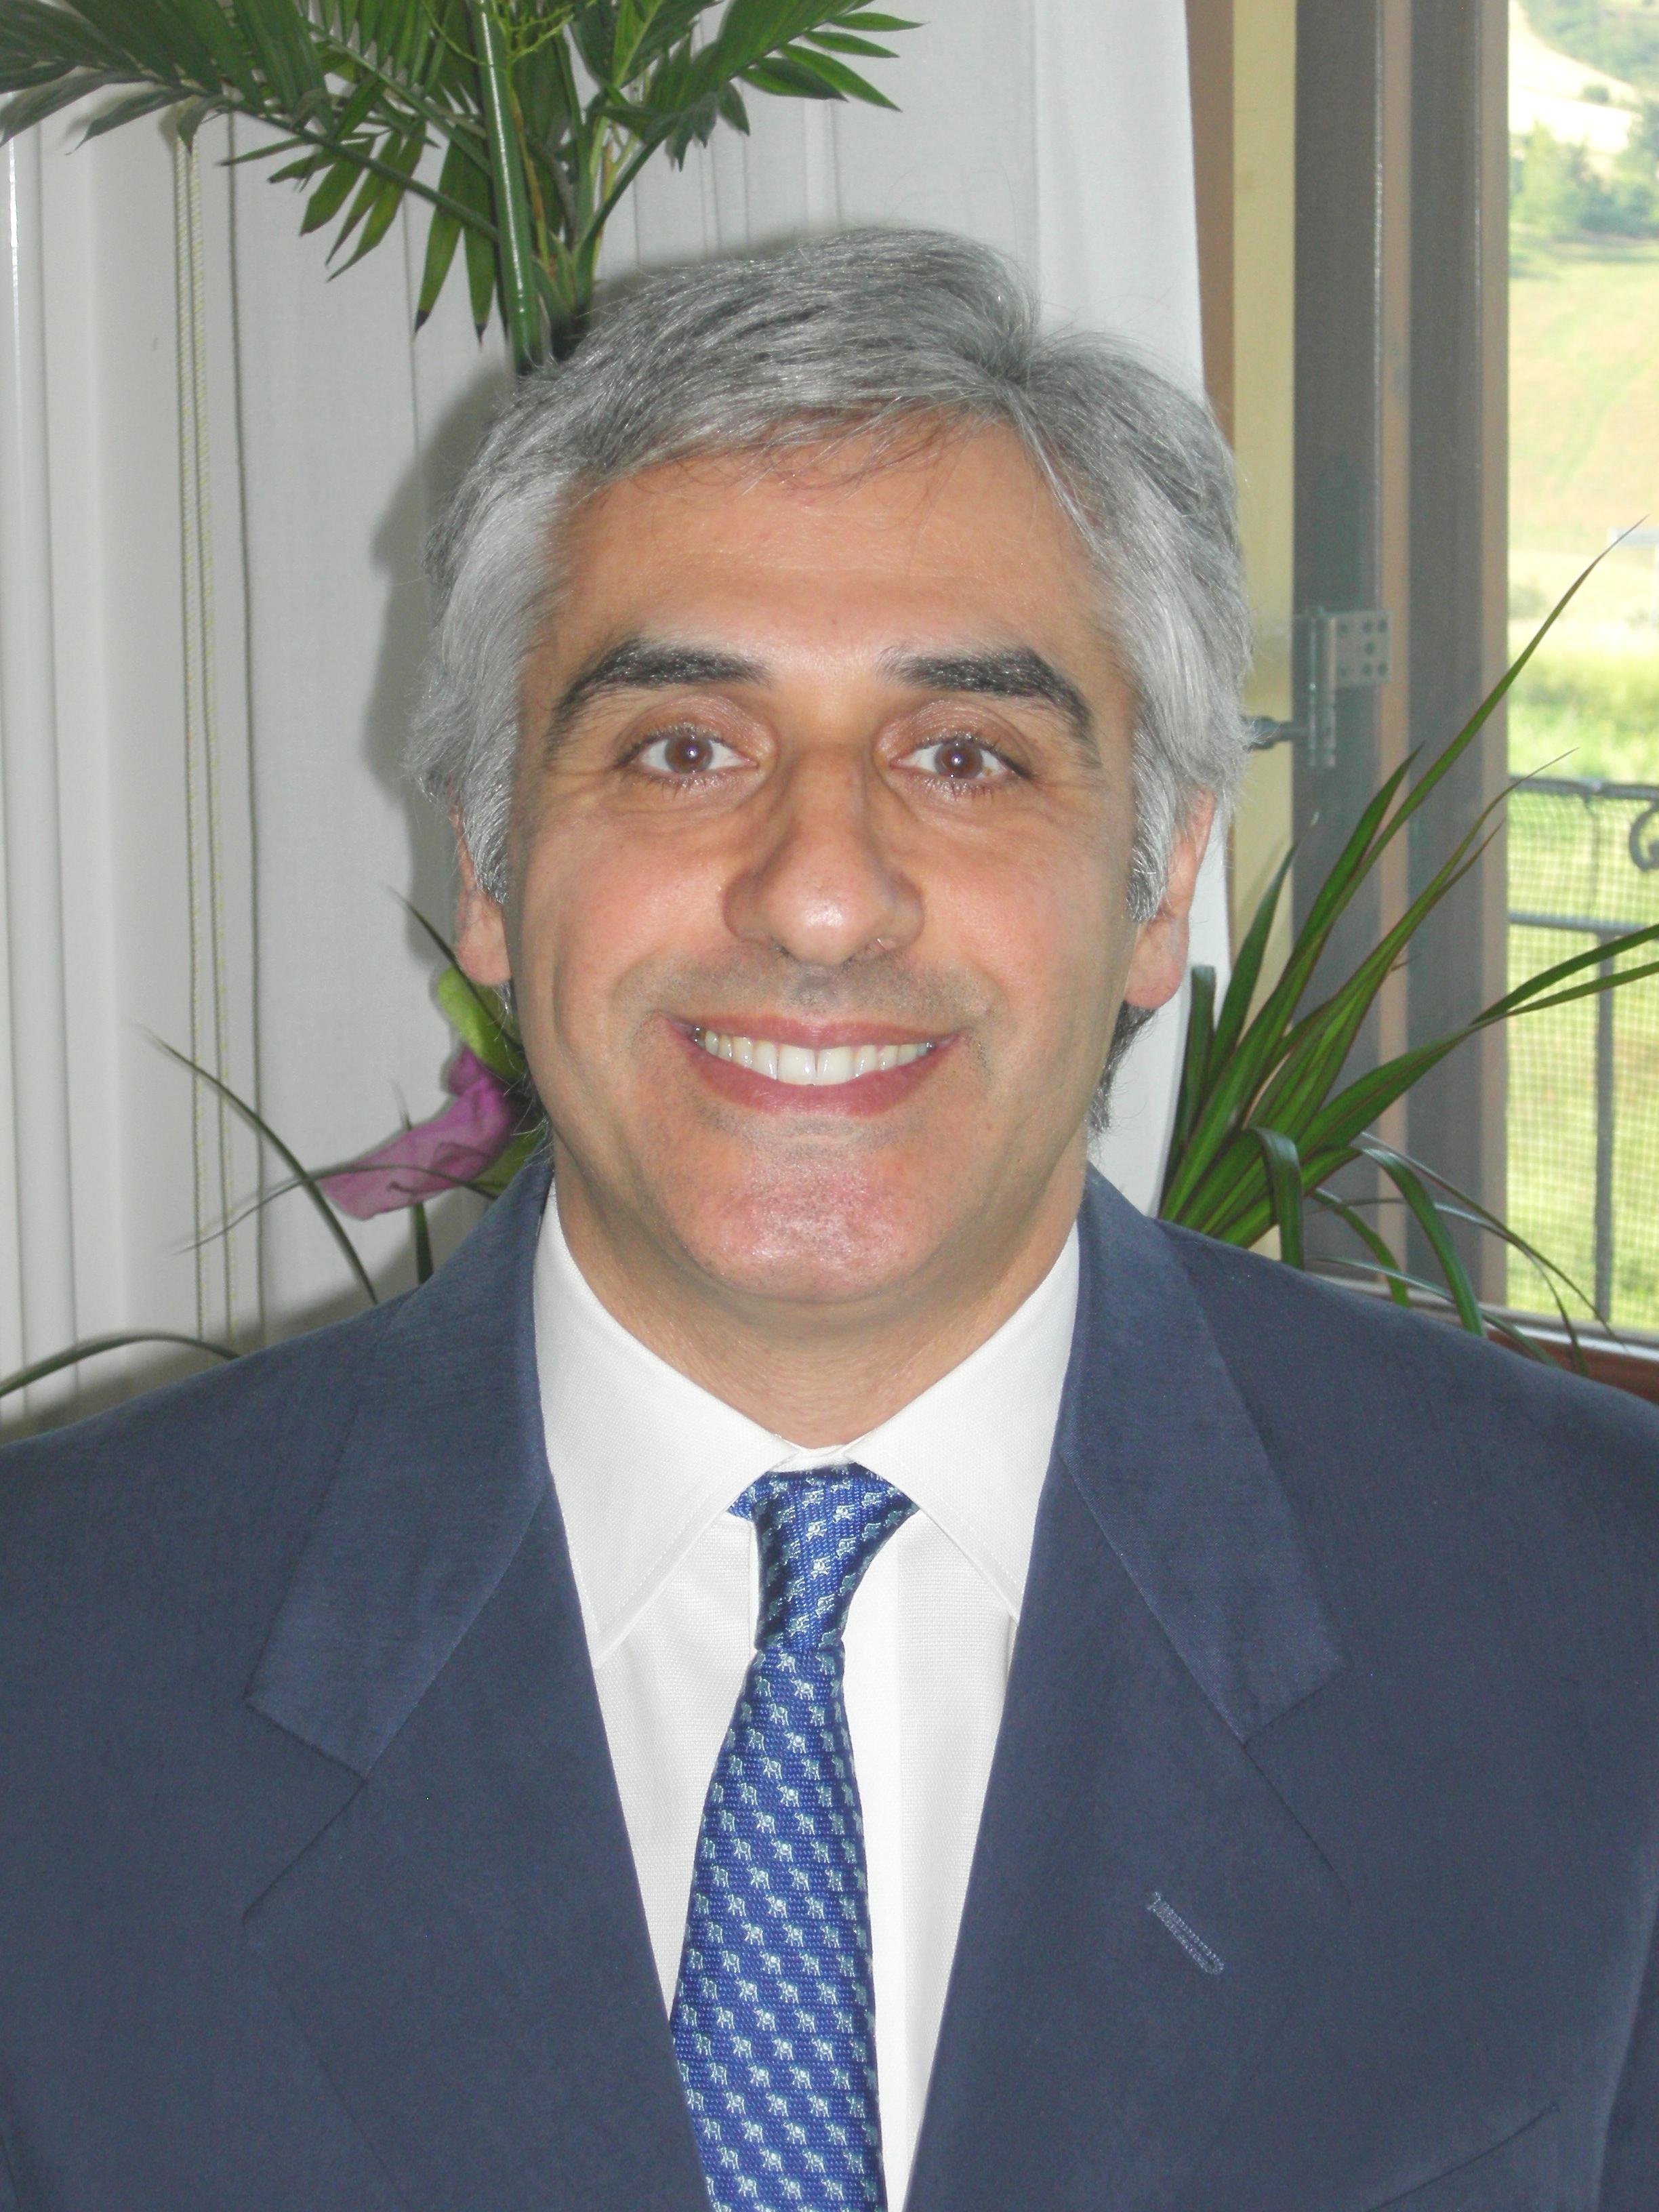 Seyed Khosrow Tayebati, PharmD, PhD